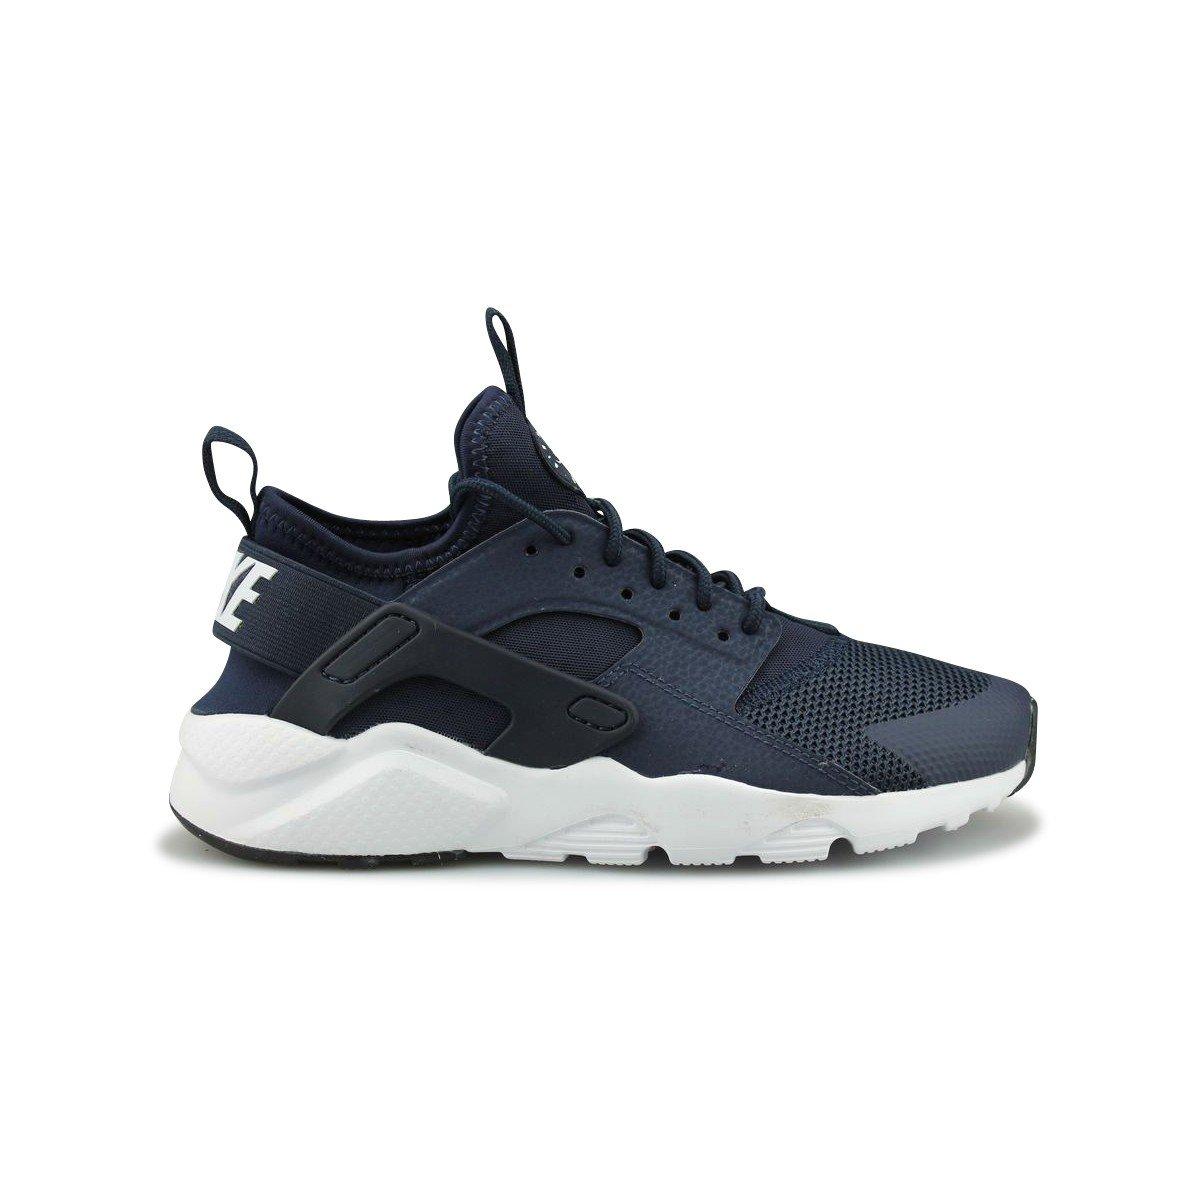 size 40 c3e20 150f2 Nike Air Huarache Ultra (GS) Sneaker Kids Trainers Boots, Dunkelblau  (Obsidian White Black), 40 EU  Amazon.co.uk  Sports   Outdoors